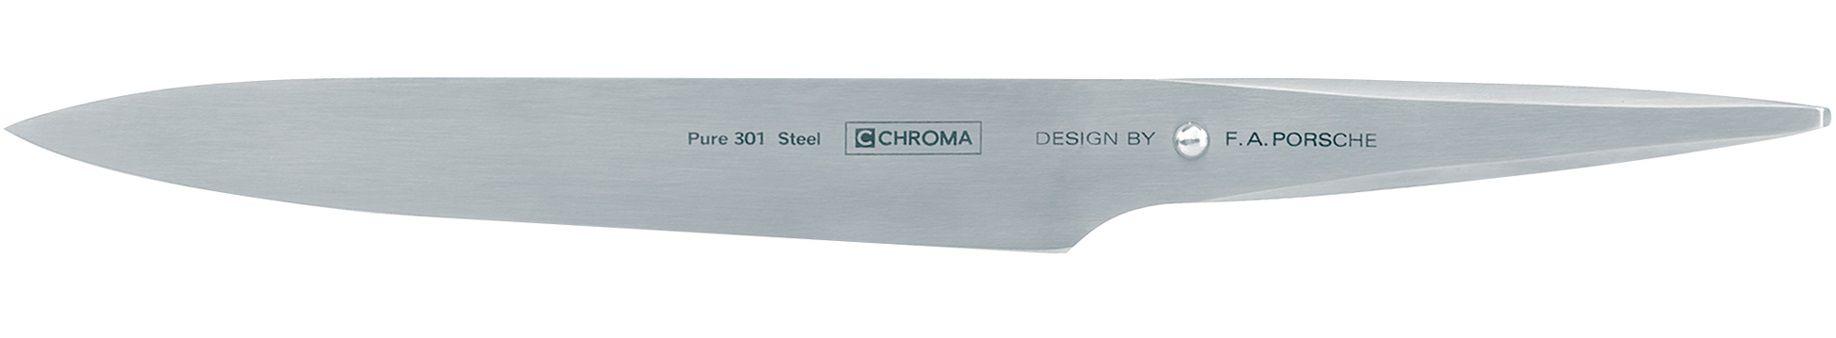 Chroma Trancheermes Type 301 P05